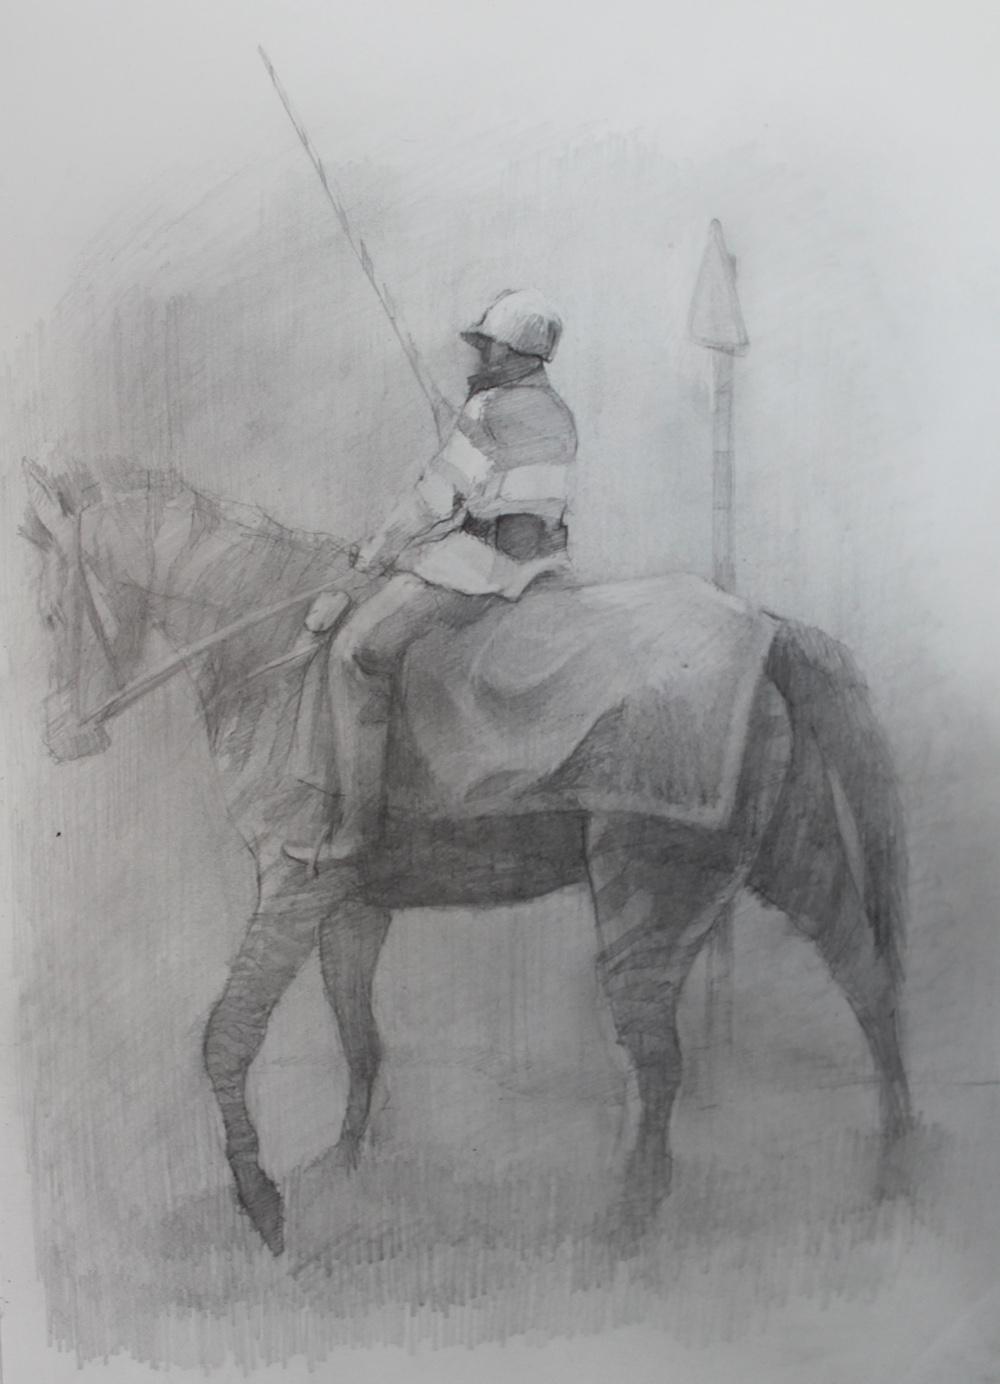 Rider, Pencil on paper, 29x21cm, 2010